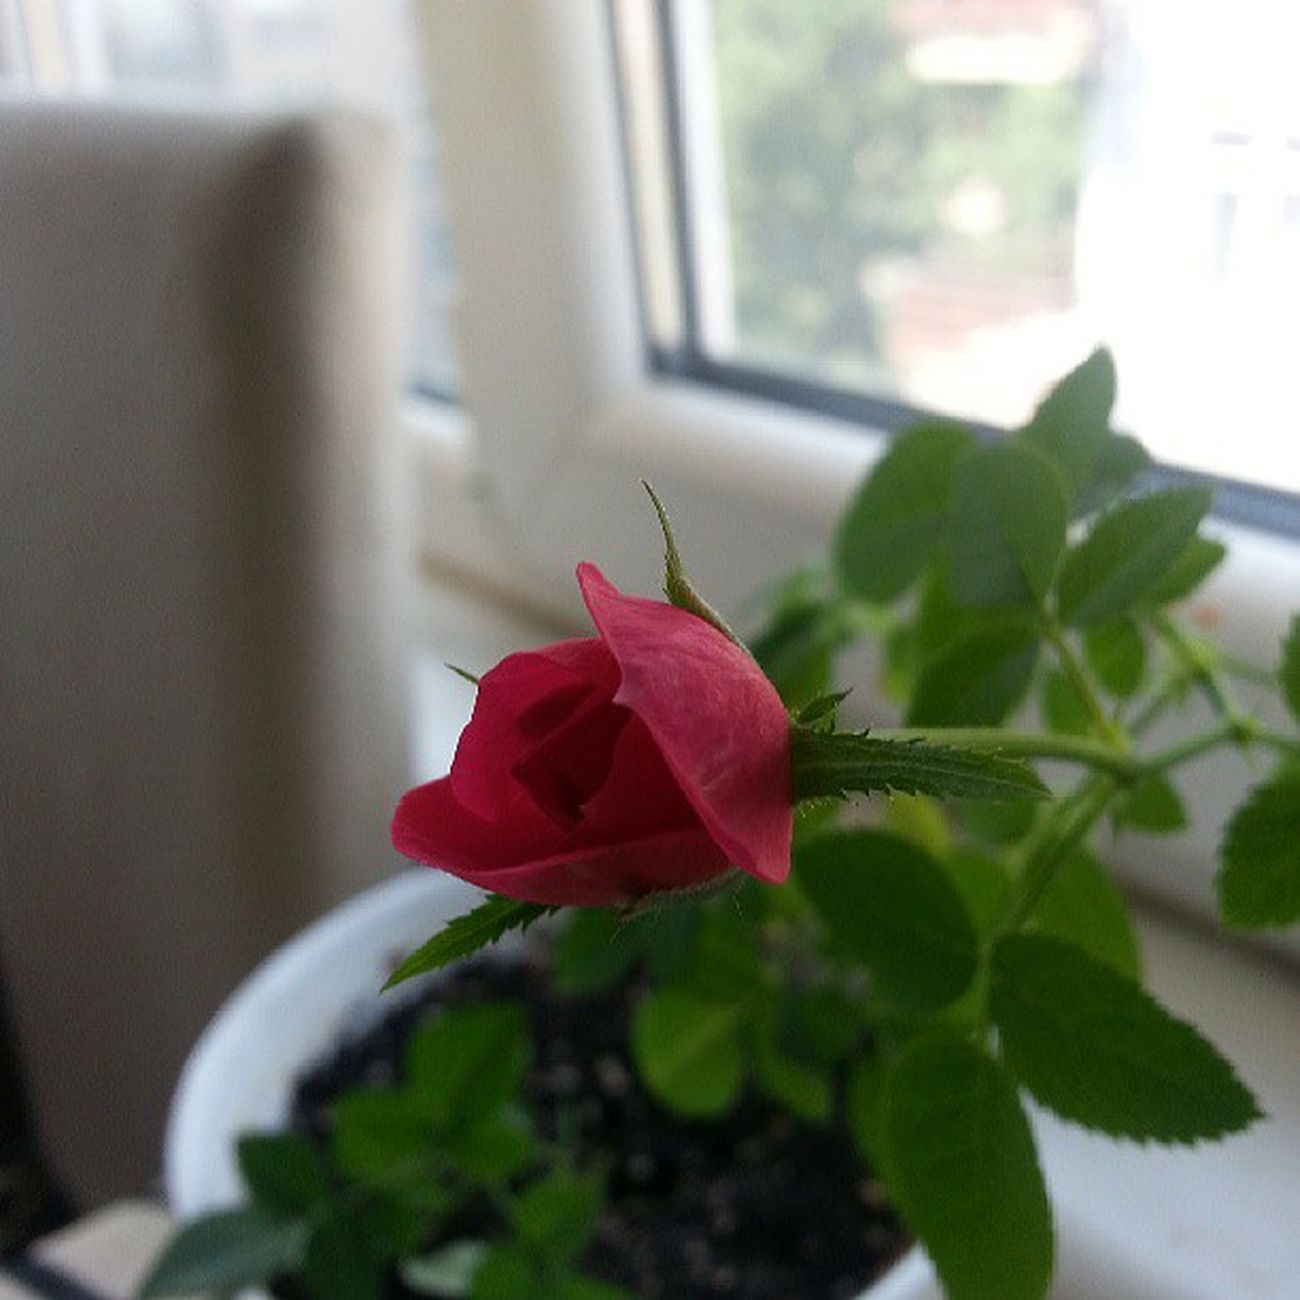 Tamamen orjinal cekim. .Instacollege Instamood Doğa Rosé spring Instagood Instapic Love ♥ Naturel Nofilter